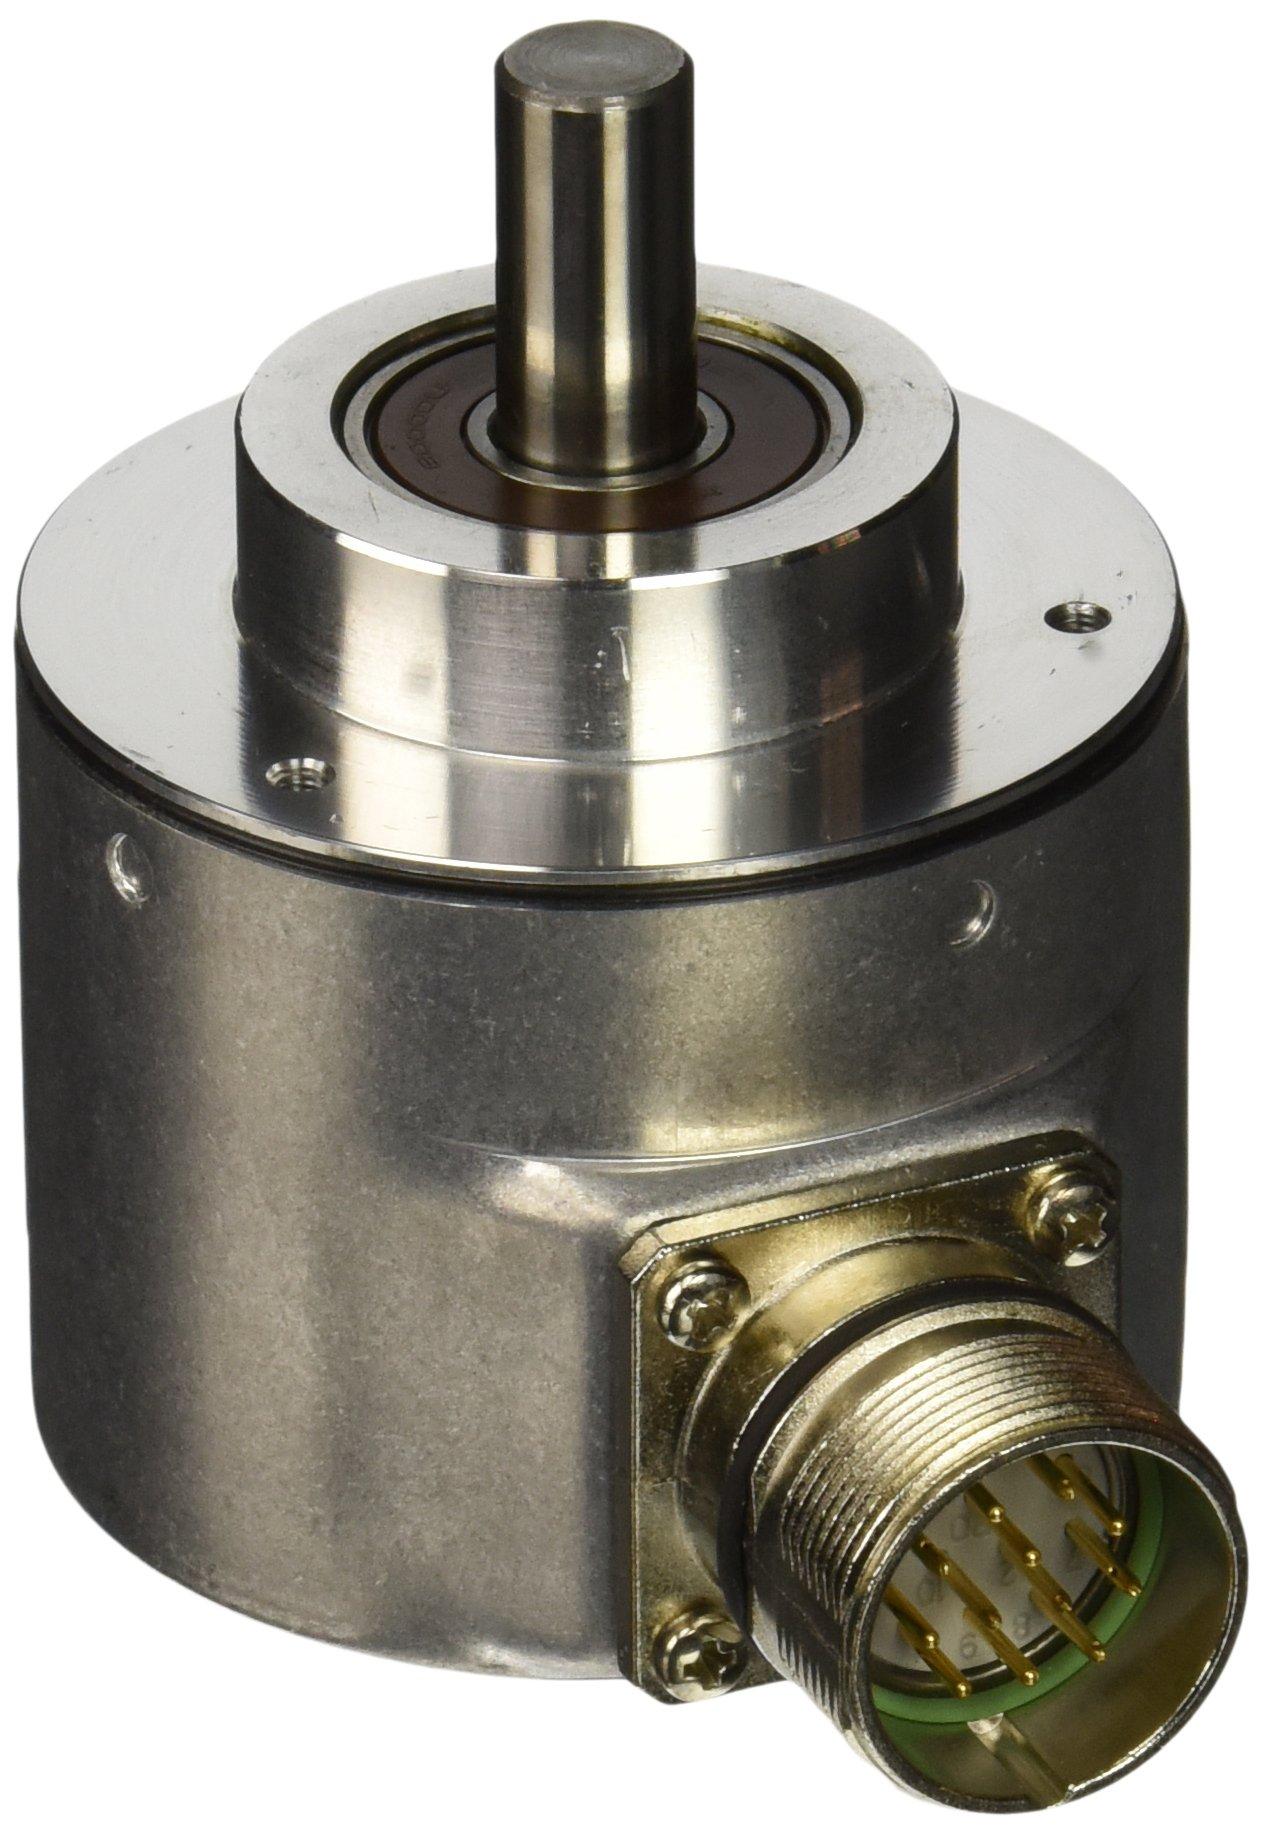 Hengstler 0522084 RI58-O/250EK.42KD Incremental Encoder, 10 mm Solid Shaft, 250 Pulses, Grey